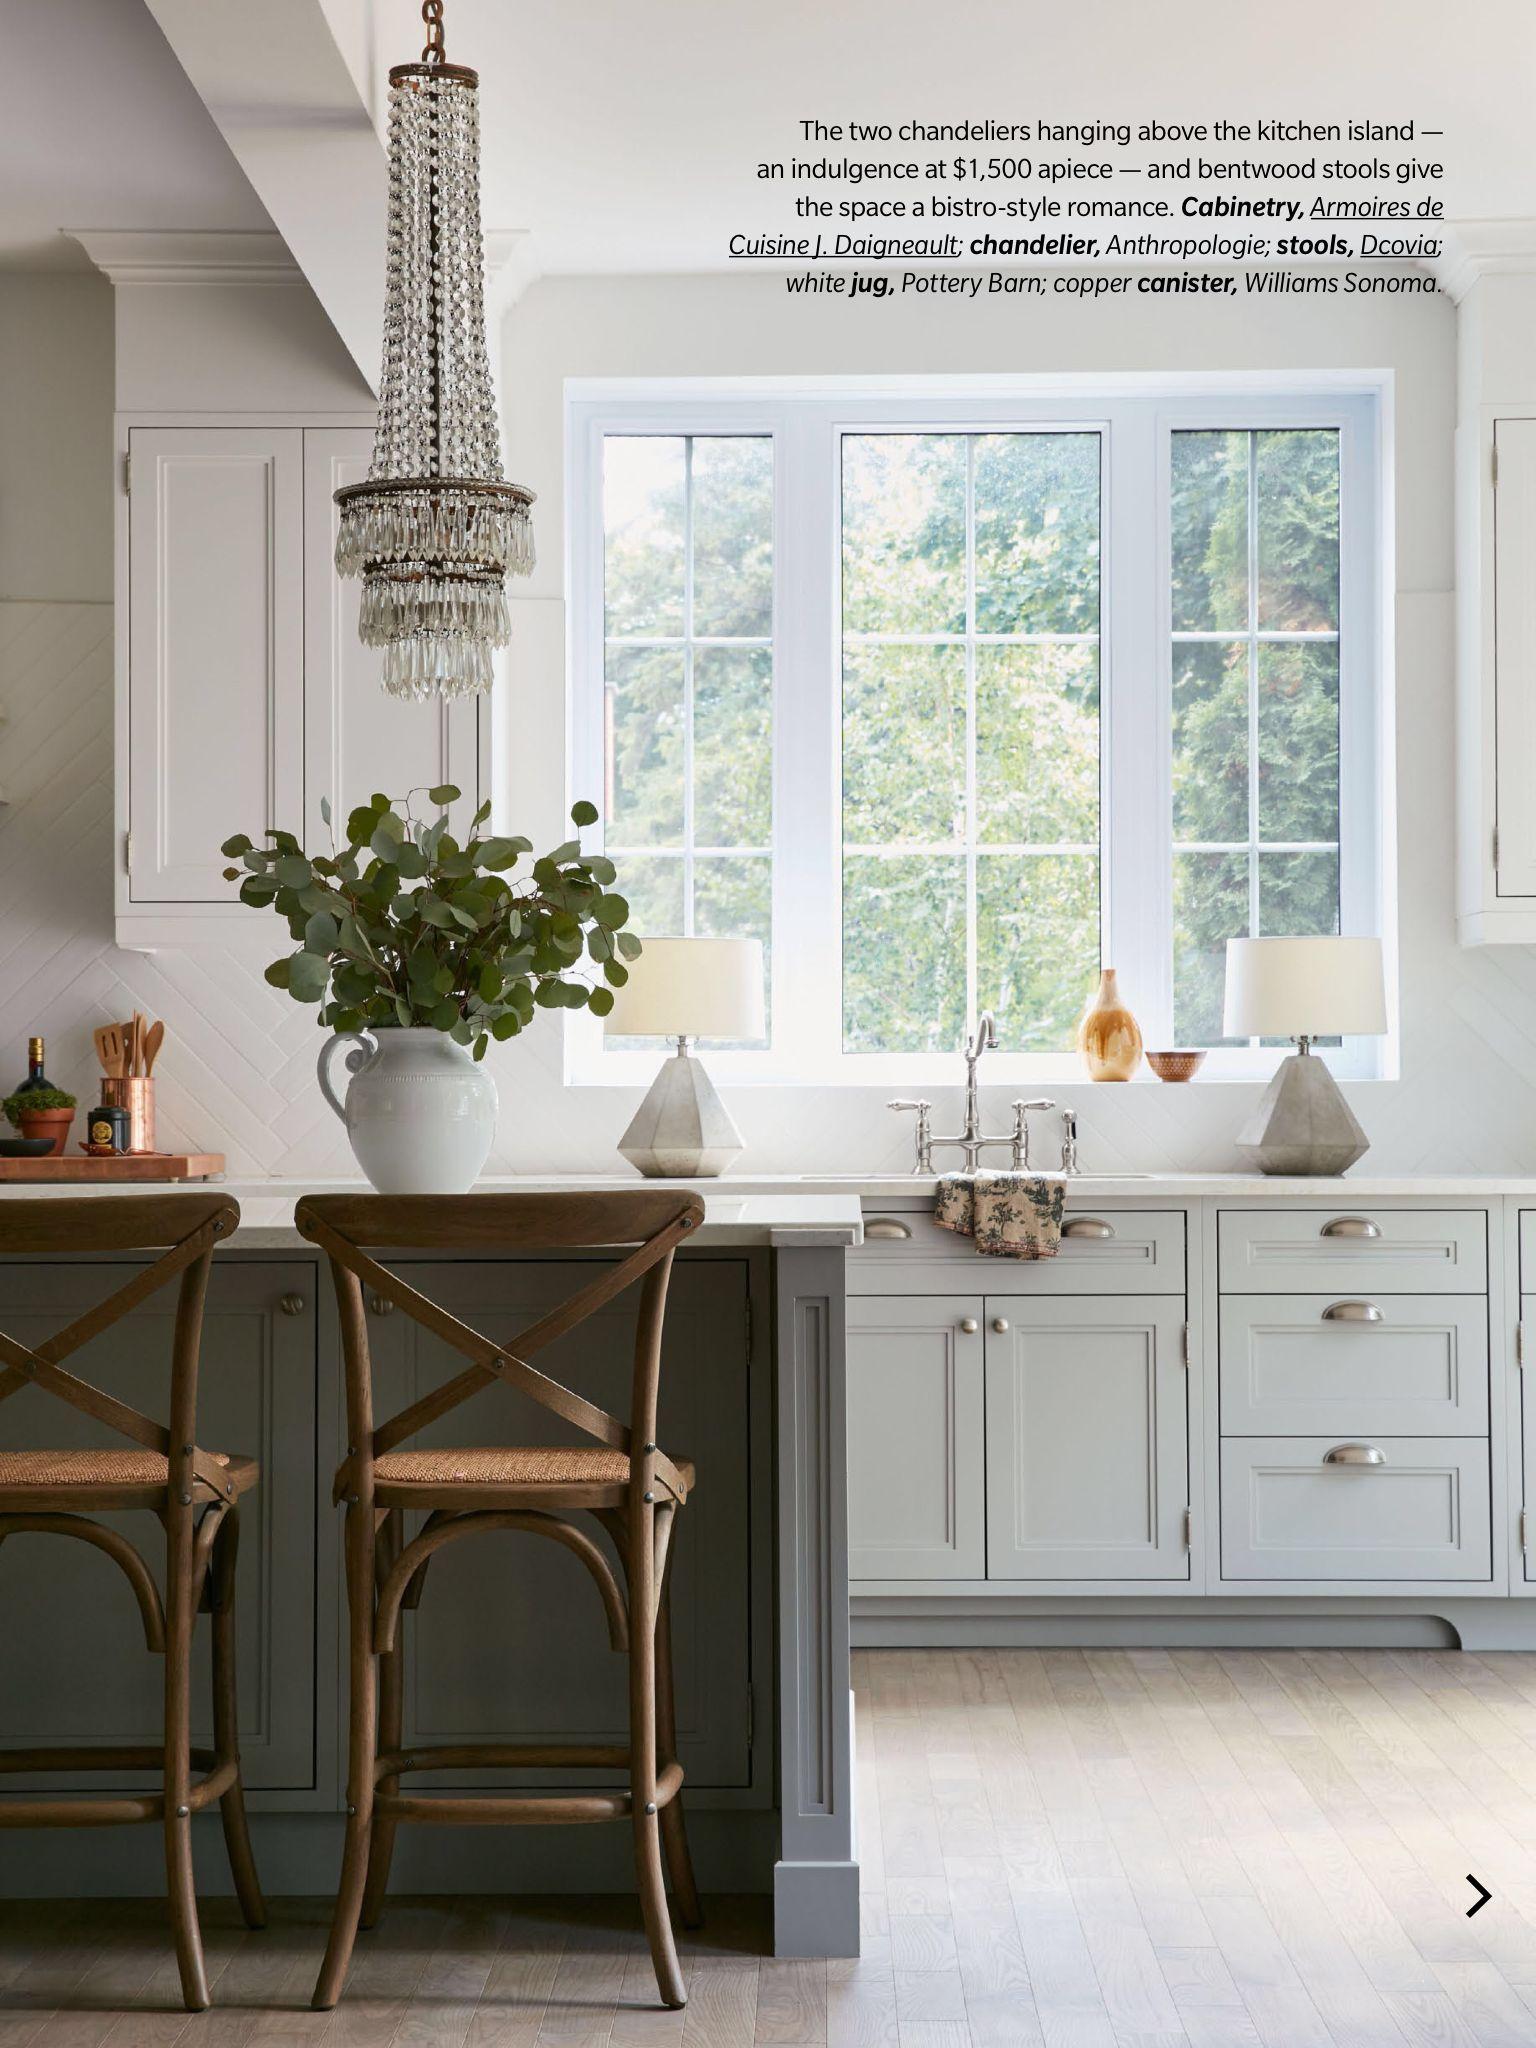 Brown Kitchen Cabinet Designs for a Warm Natural Look Kitchen